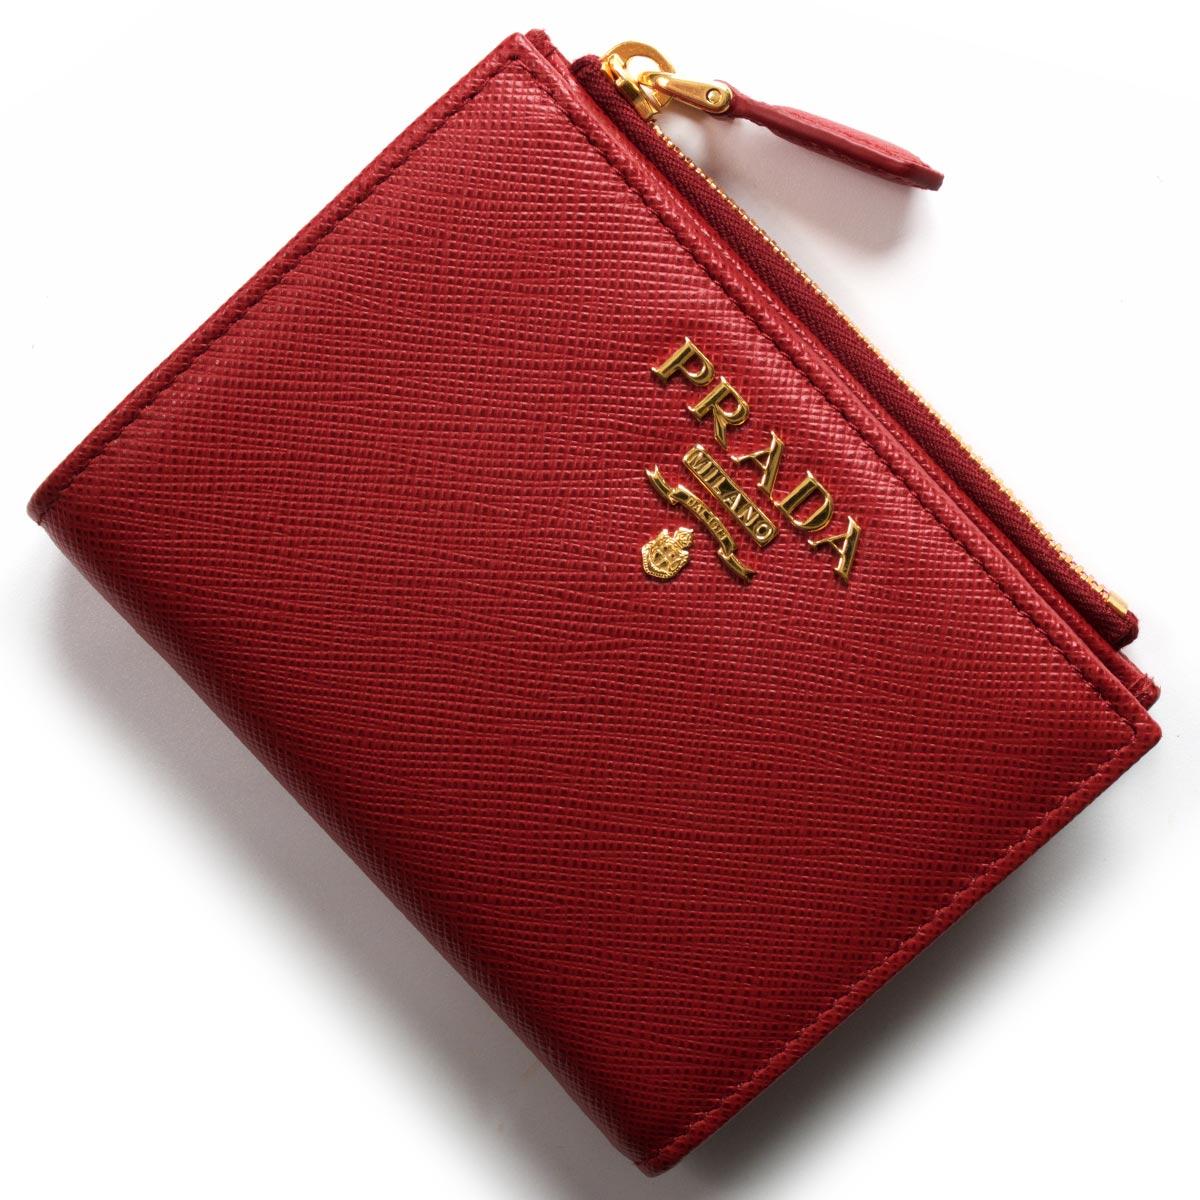 b8ebf891cfac プラダ シャネル 二つ折り財布 財布 レディース 長財布 サフィアーノ ...